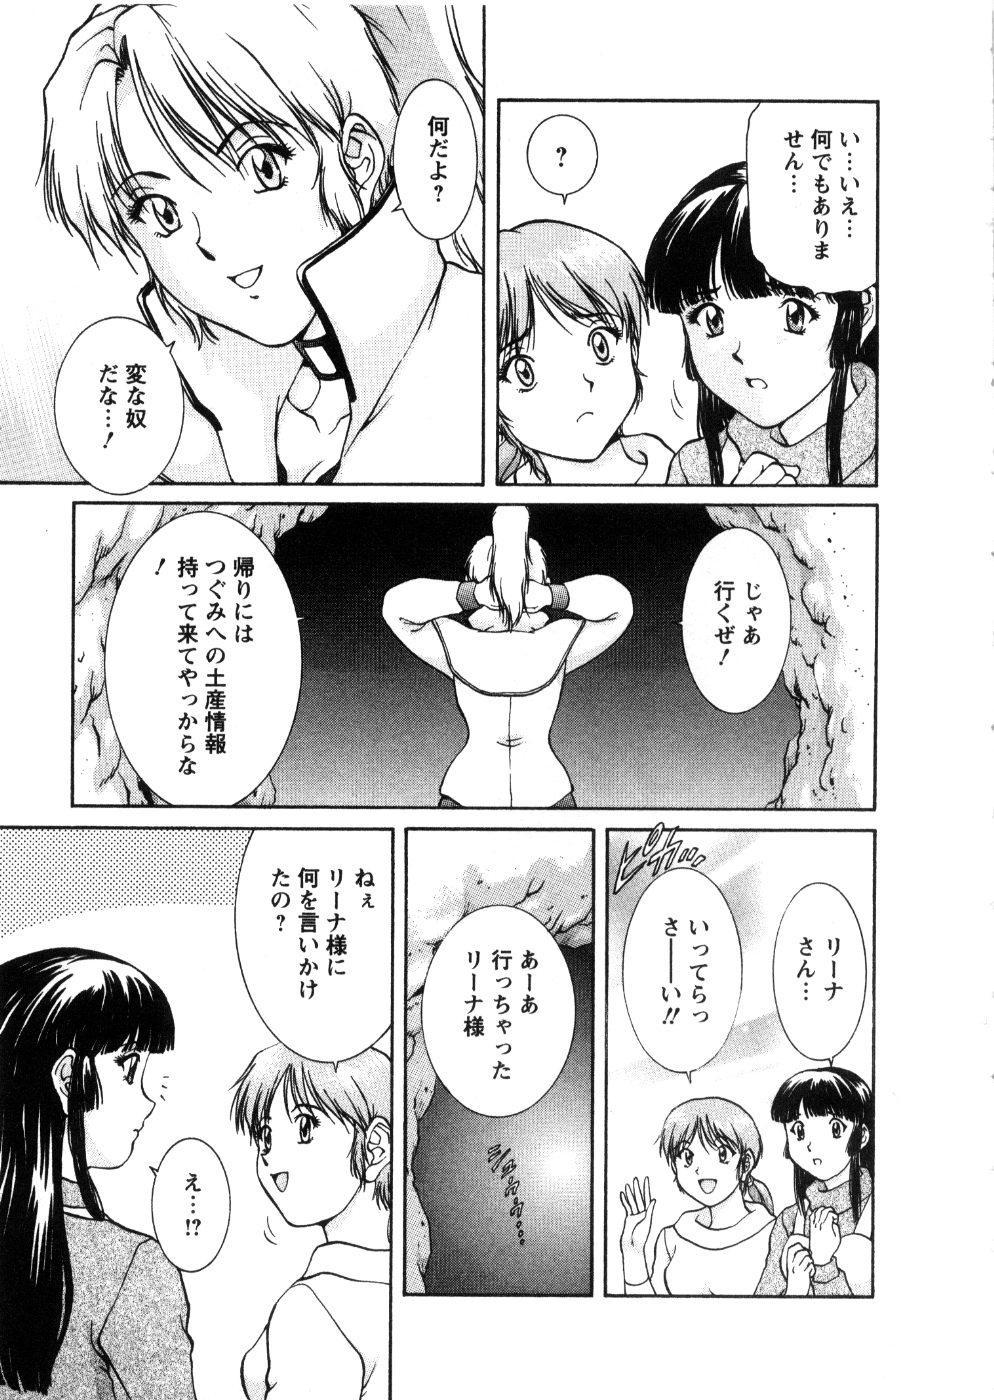 Oneechan-tachi ga Yatte Kuru 03 114